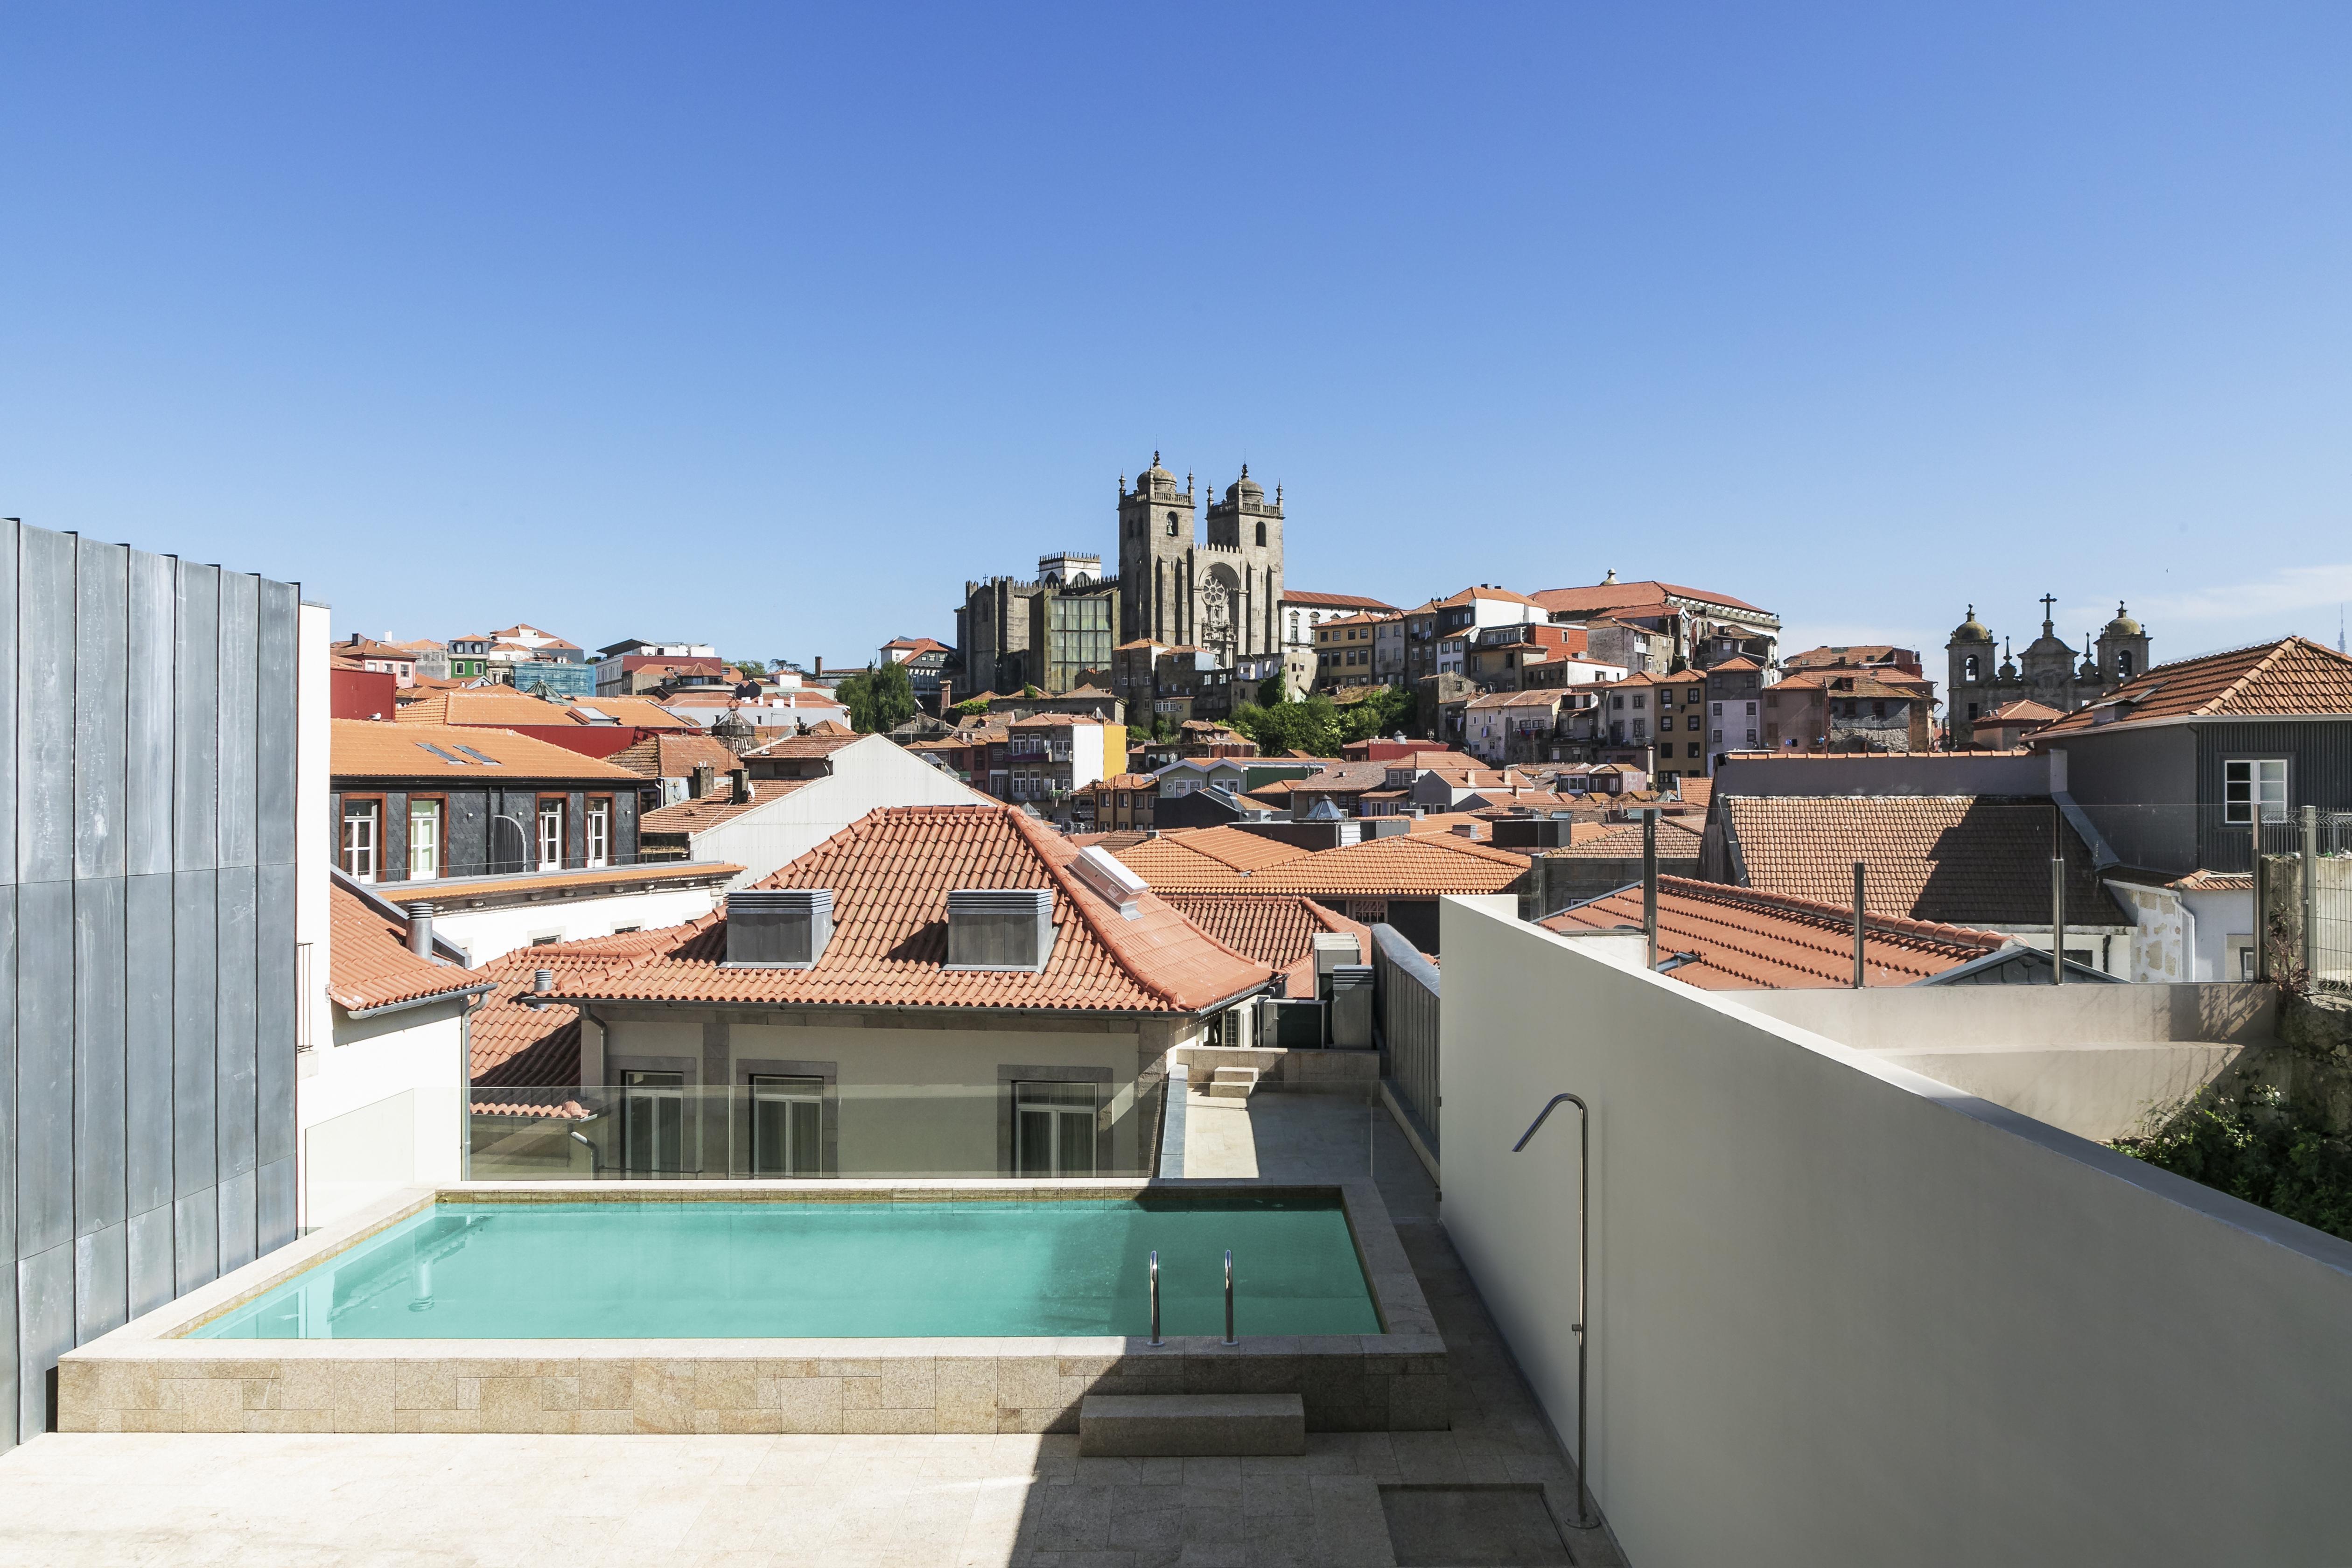 Hotel de luxo no Porto